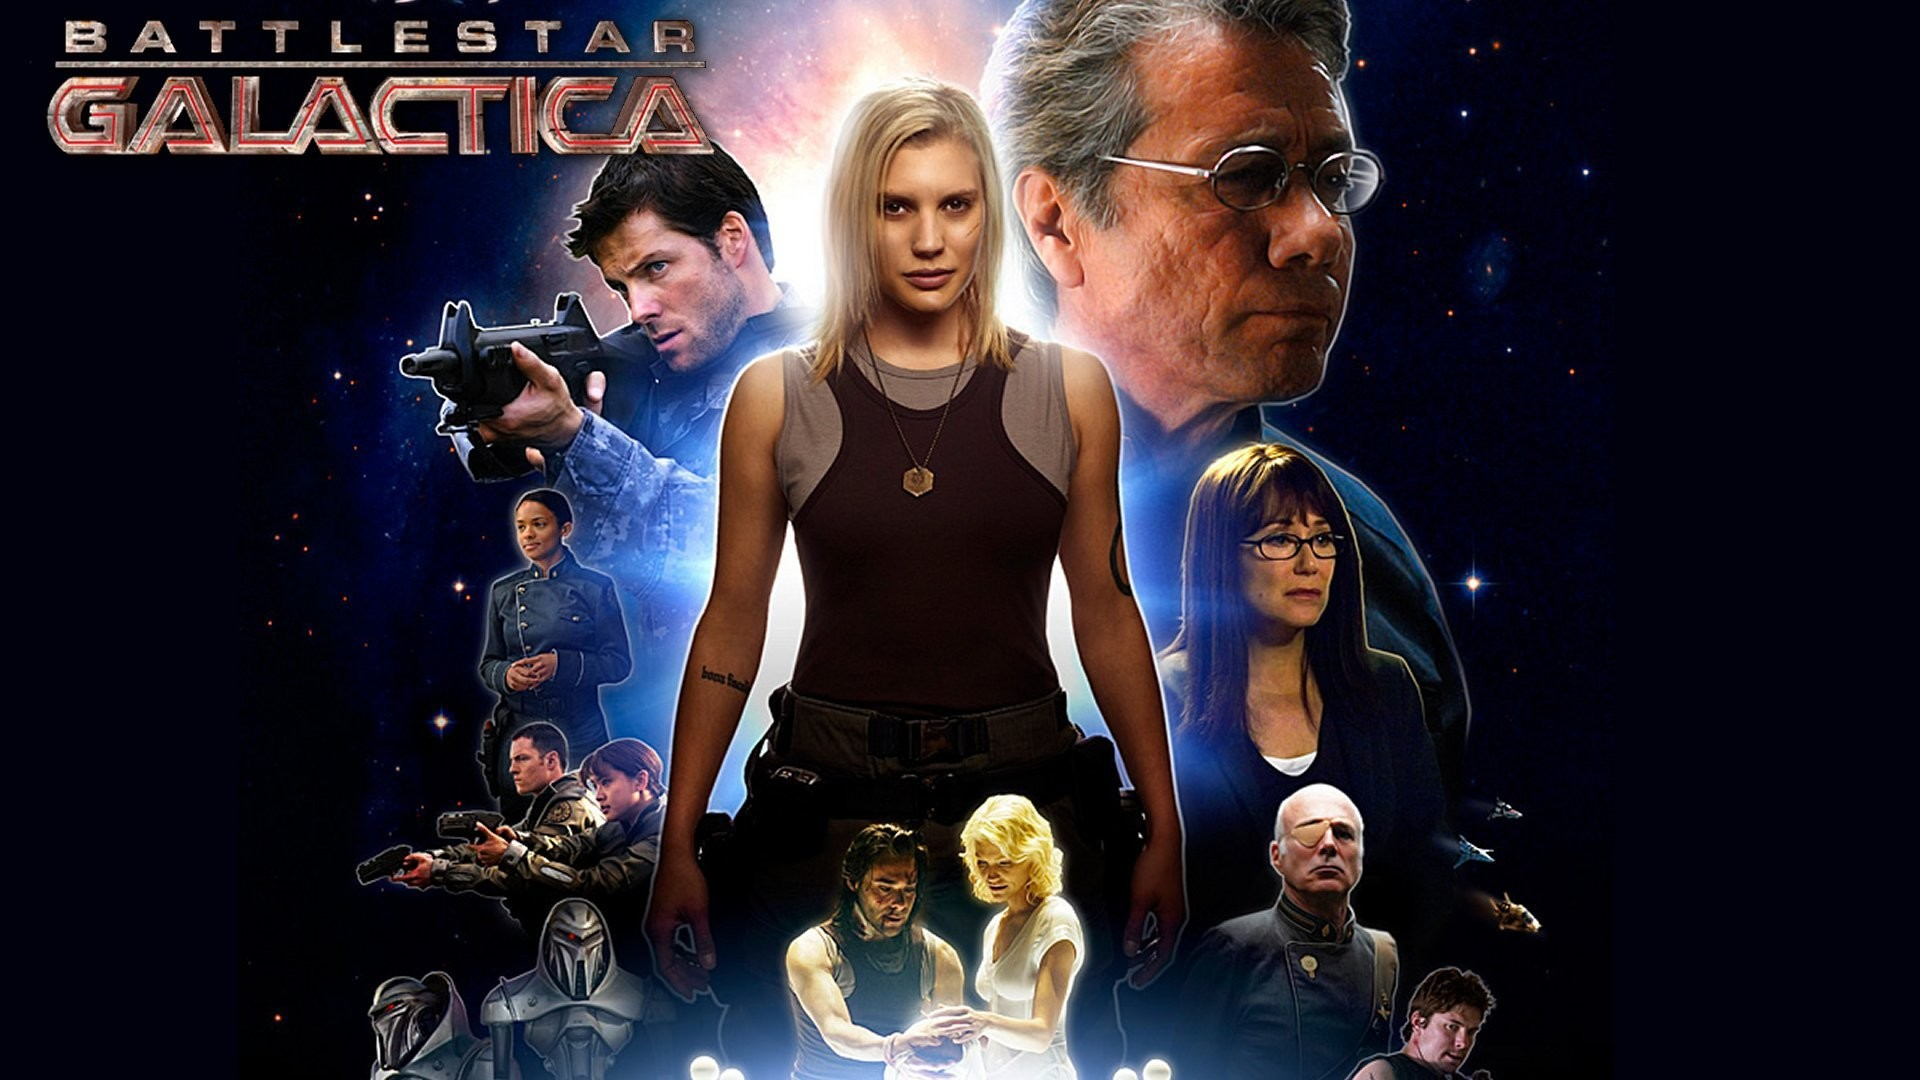 Battlestar Galactica Poster. 78; 1920×1080; 0